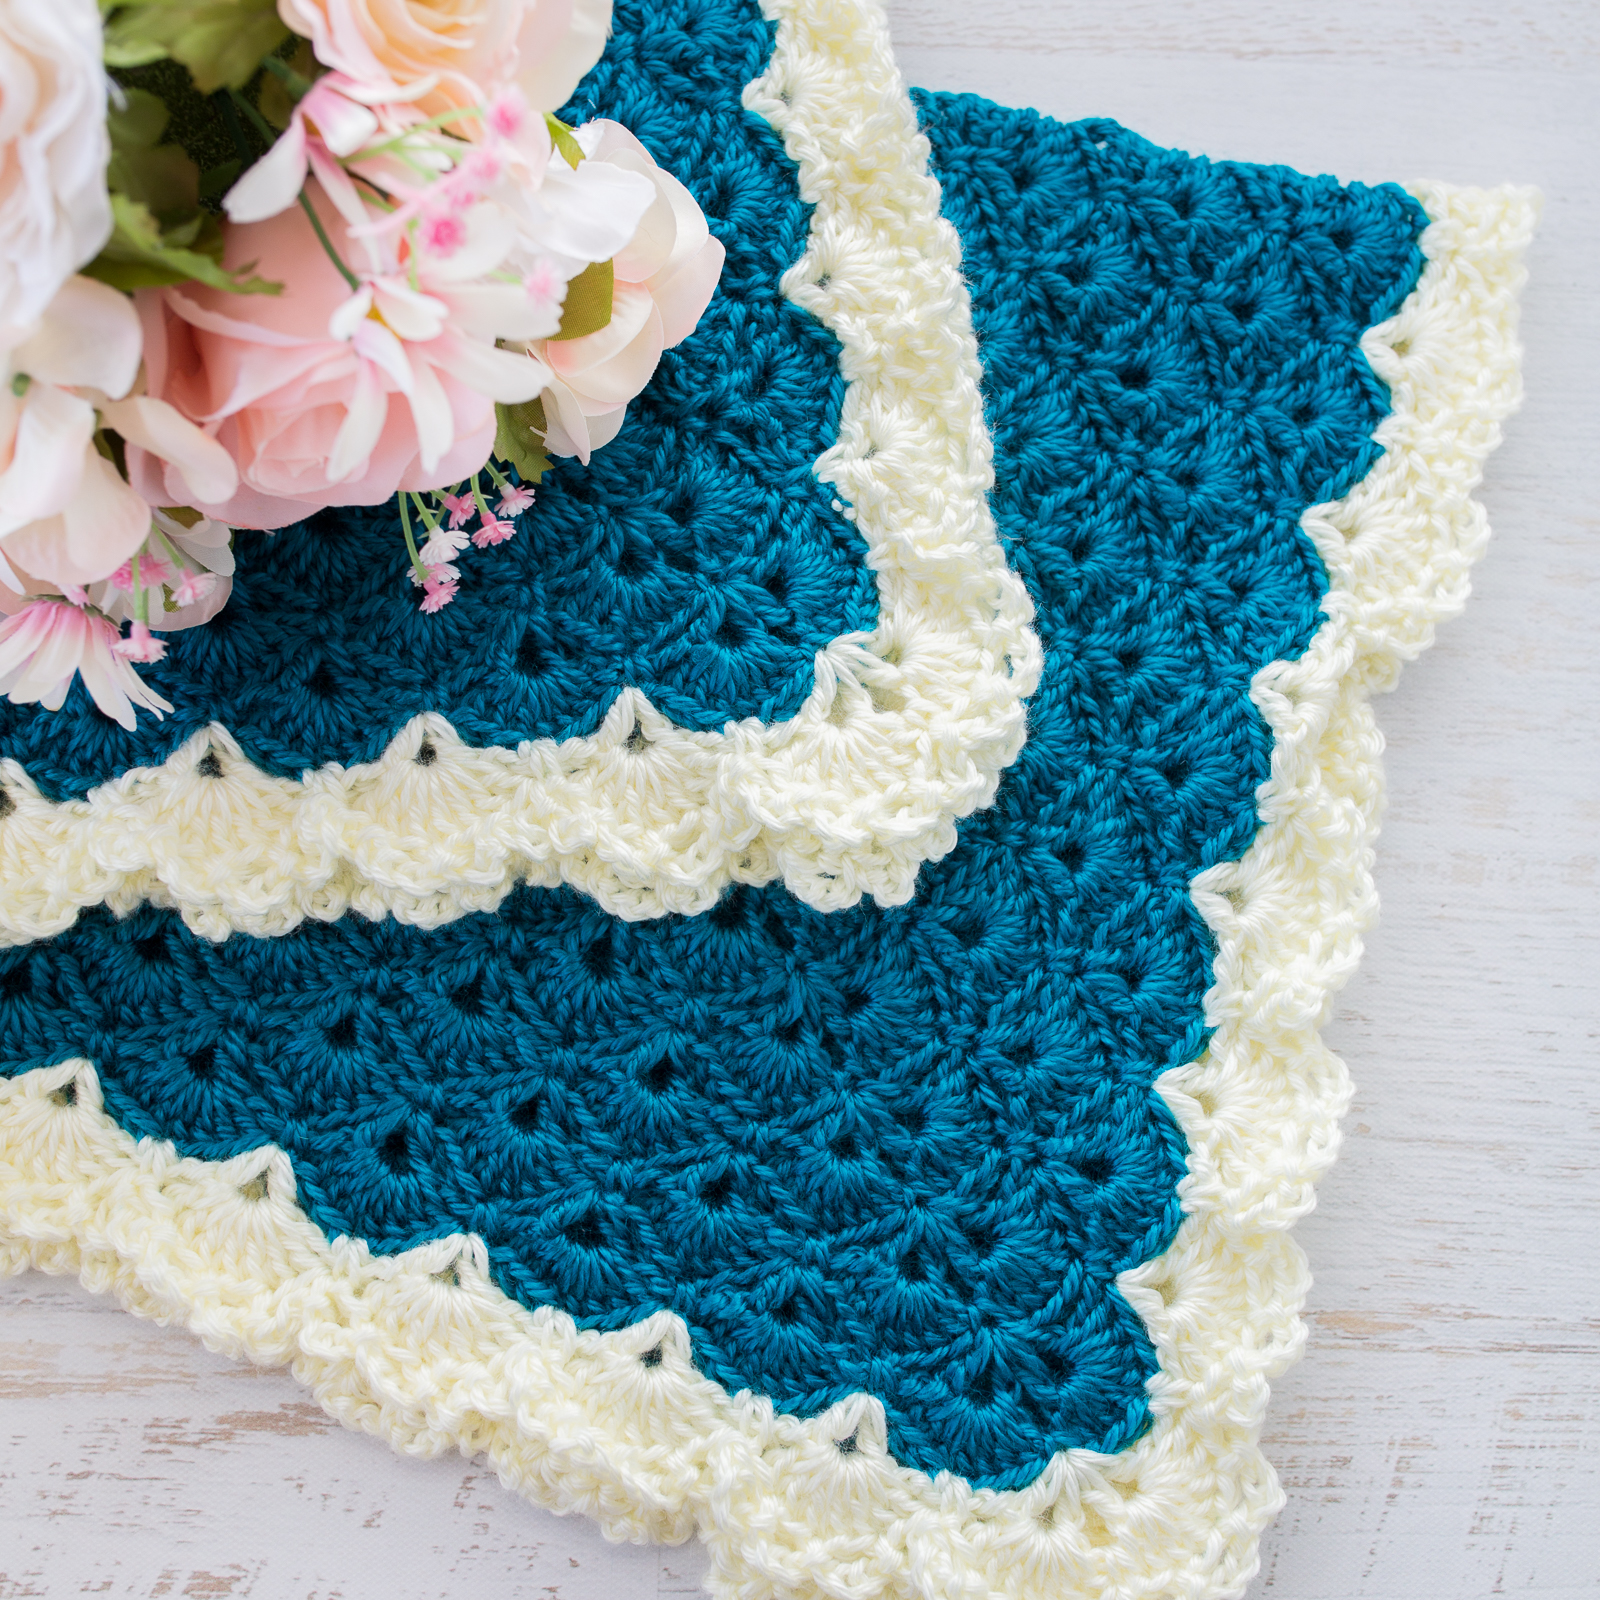 Antique Charm Crochet Blanket Loganberry Handmade